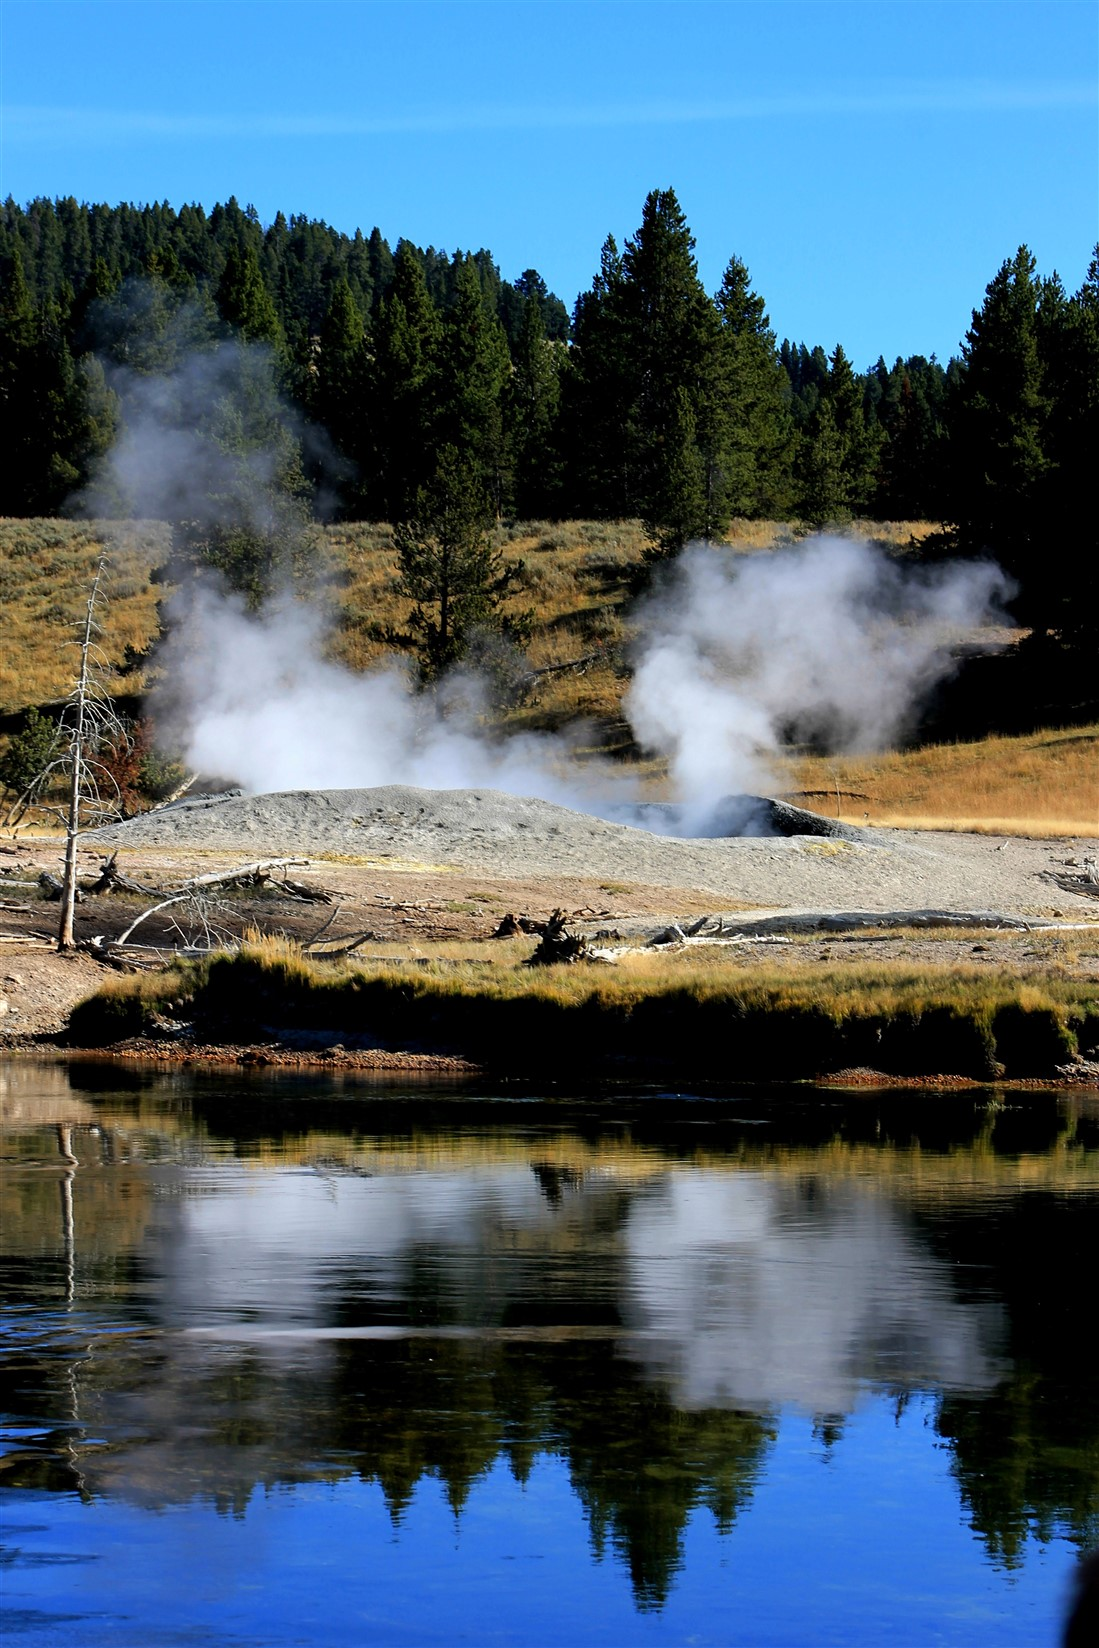 2015 09 11 59 Yellowstone National Park WY.jpg